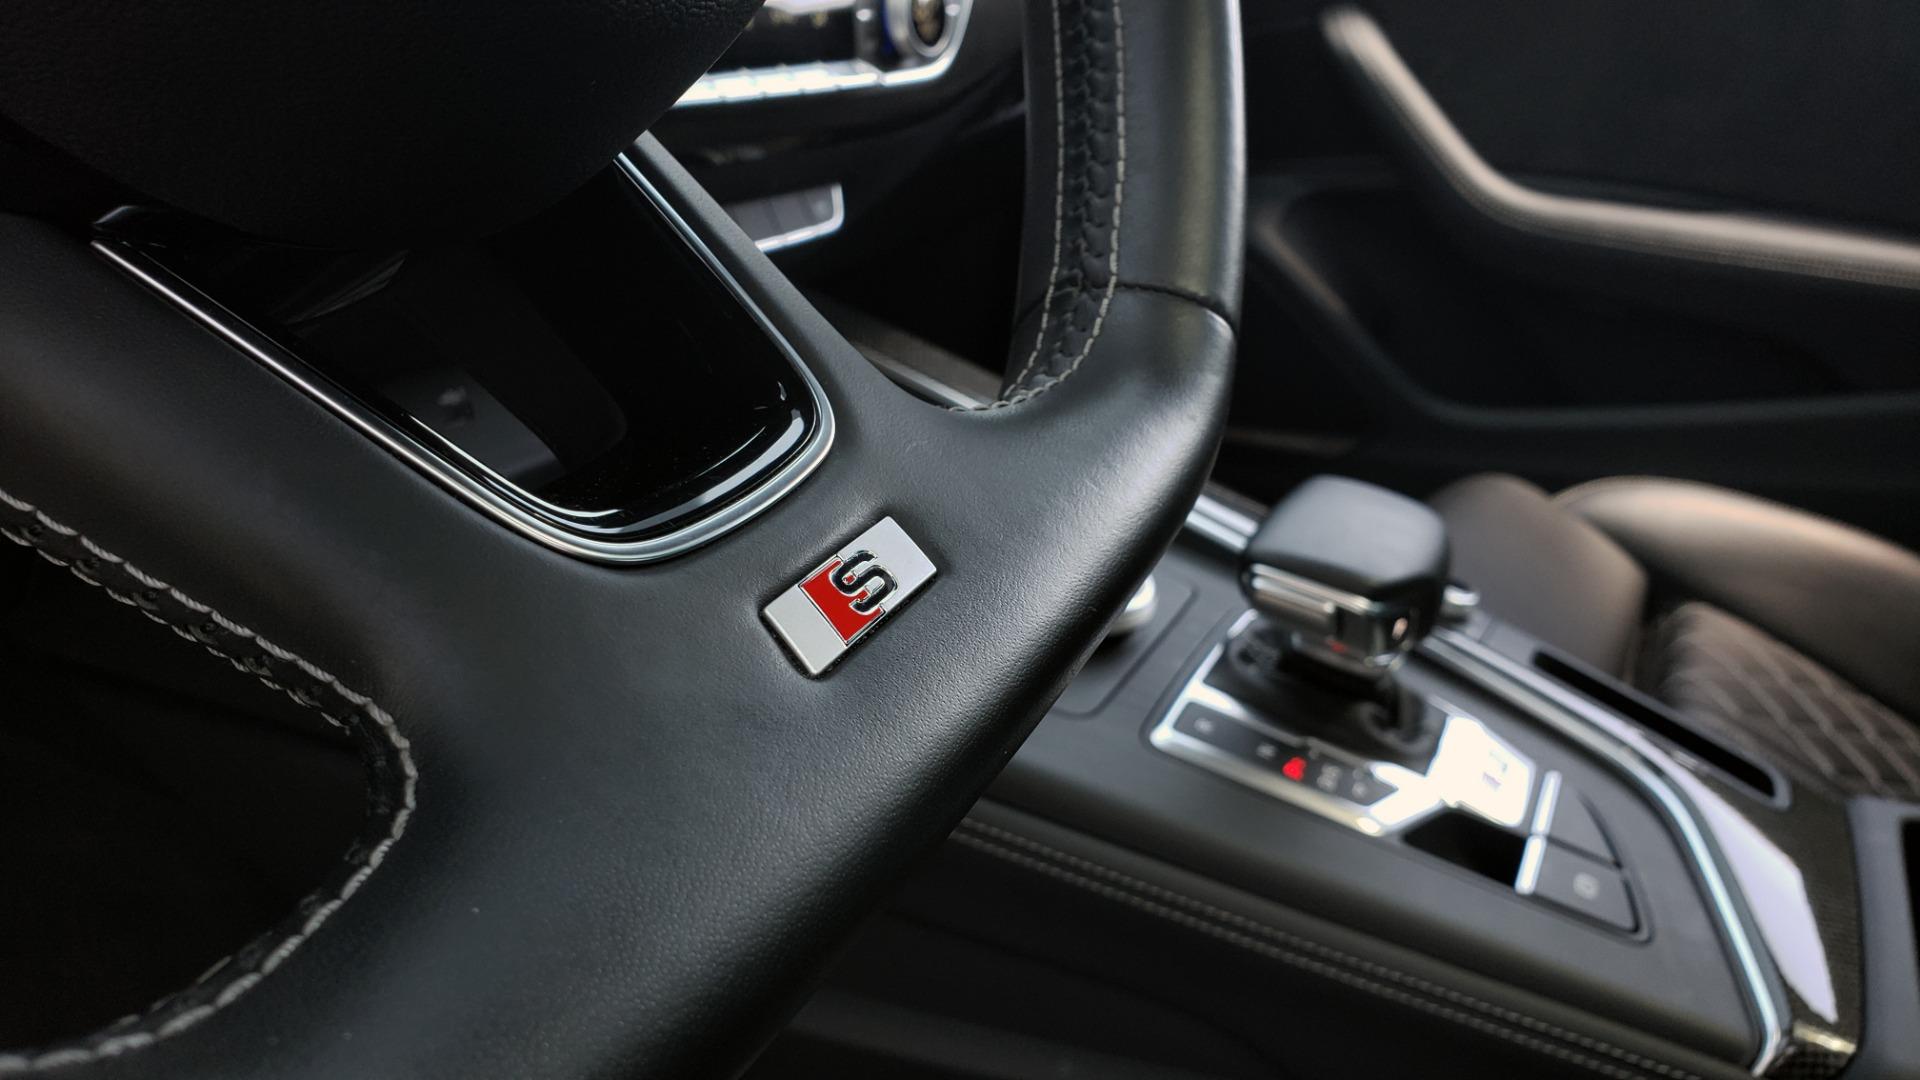 Used 2018 Audi S5 SPORTBACK PRESTIGE S-SPORT / NAV / SUNROOF / HUD / B&O SND / REARVIEW for sale $48,995 at Formula Imports in Charlotte NC 28227 46